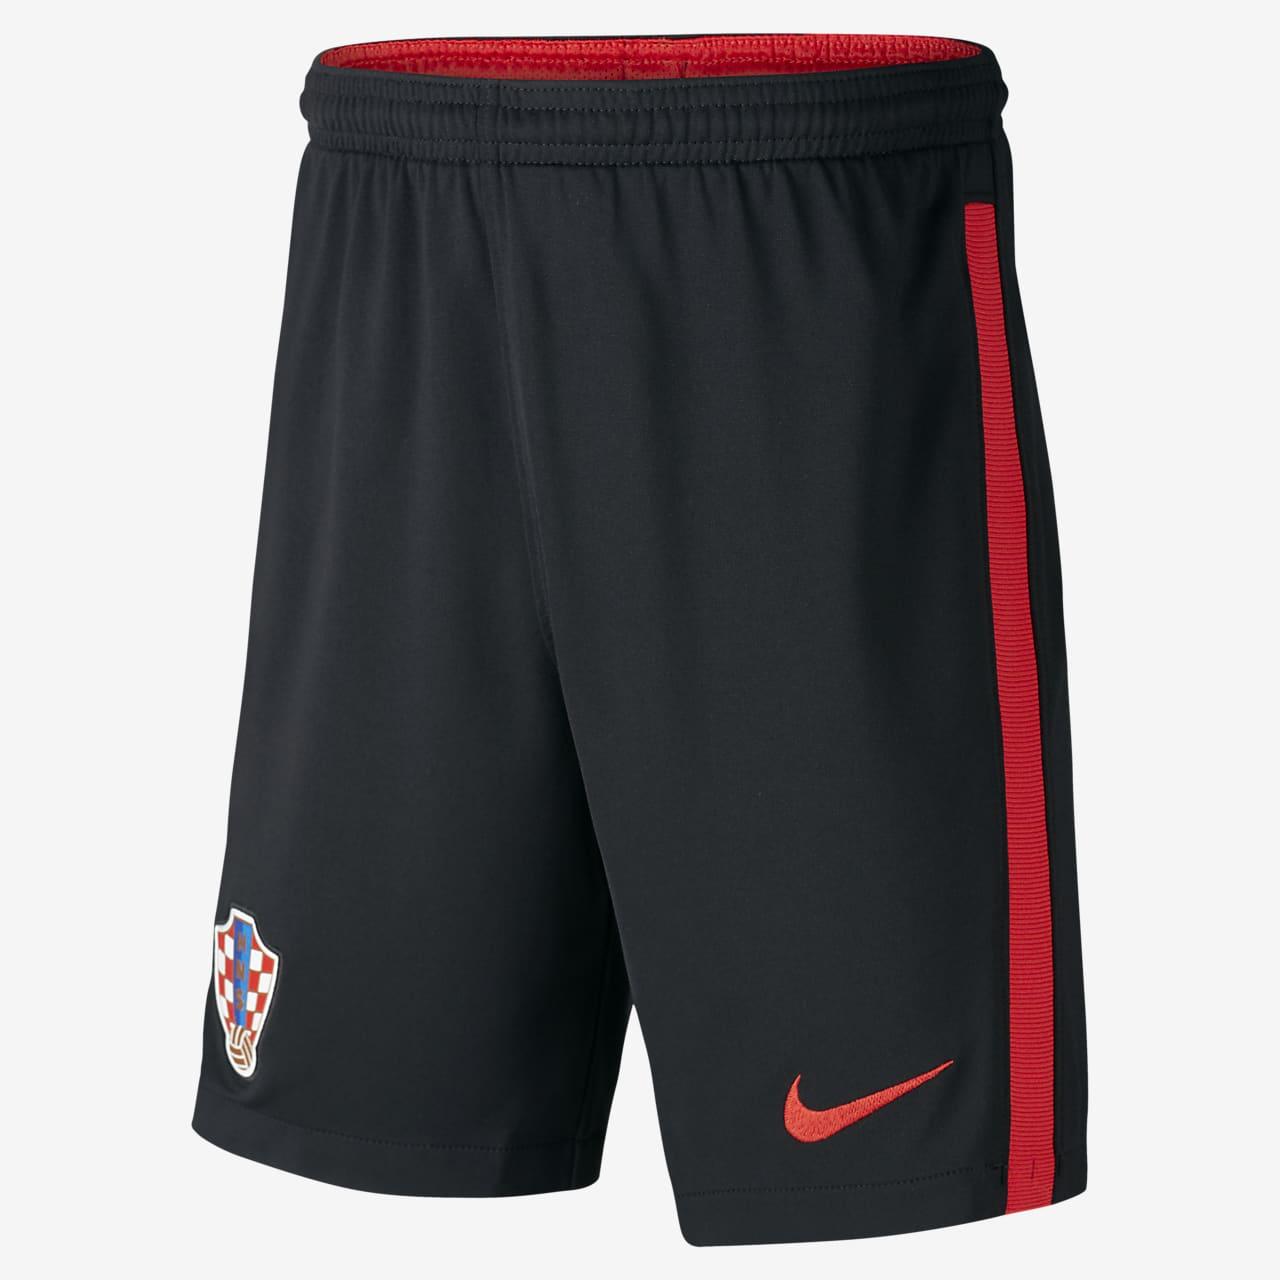 Croatia 2020 Stadium Home/Away Older Kids' Football Shorts